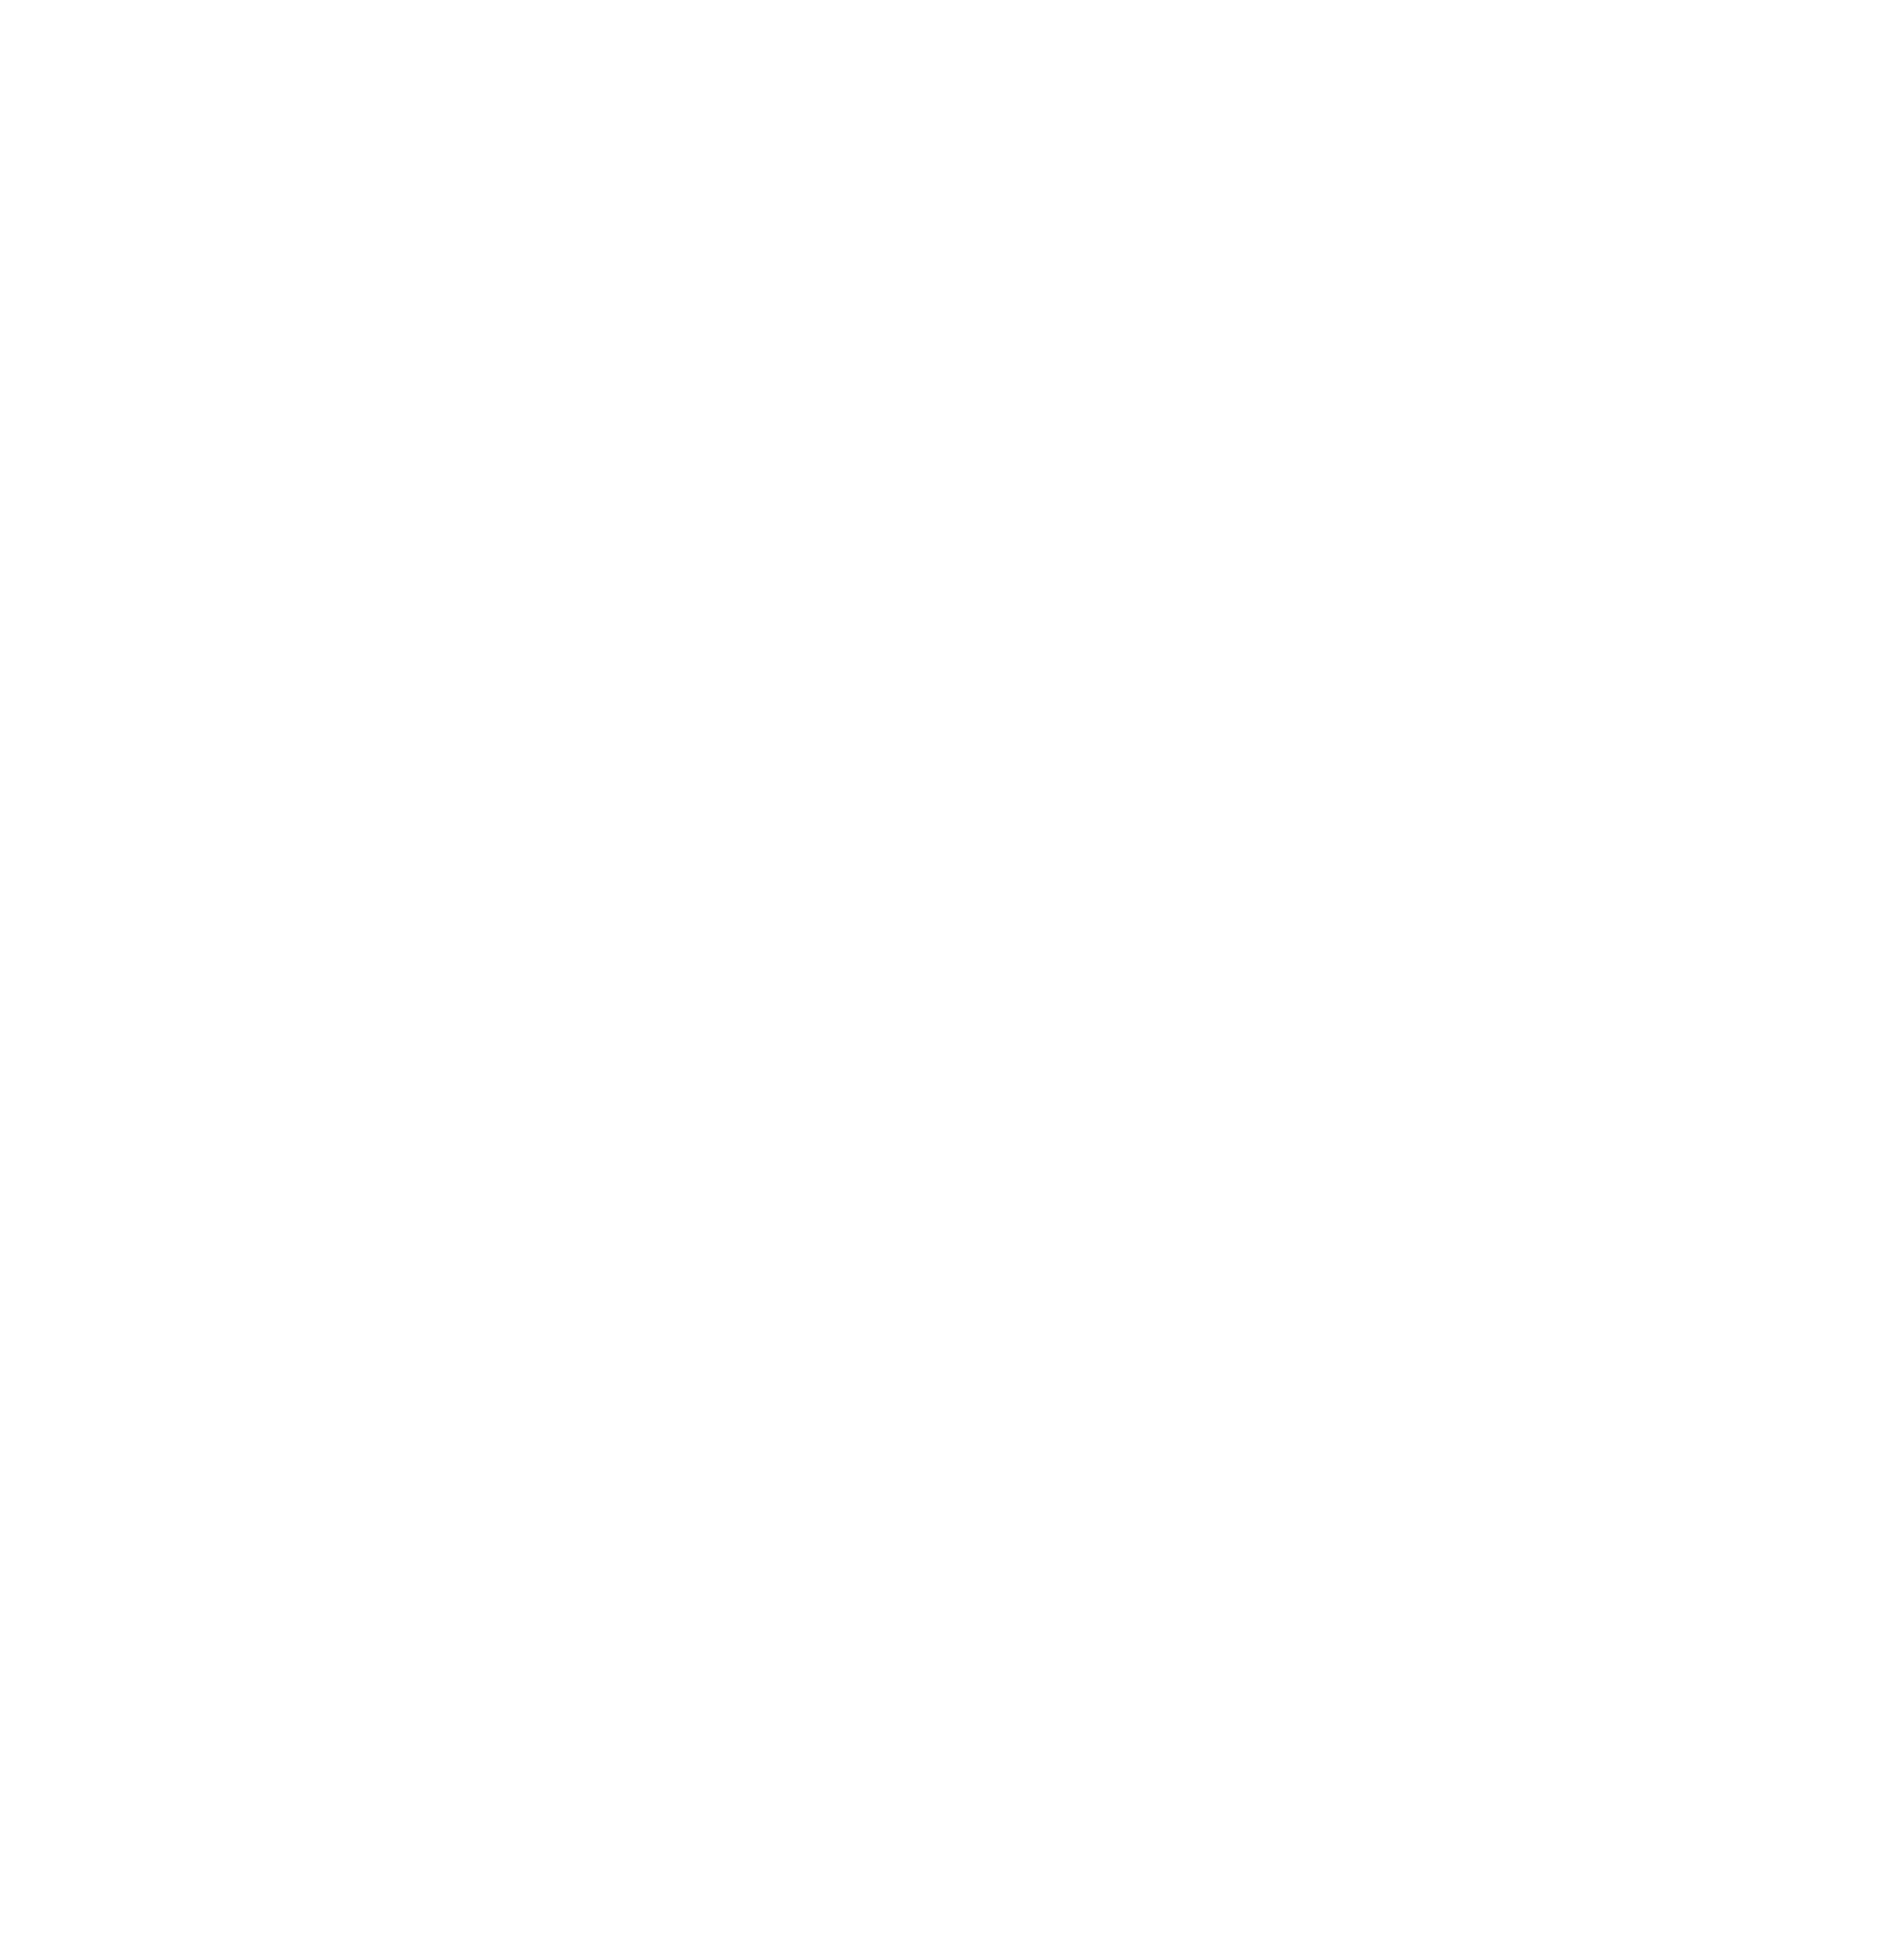 Scottish Health Council